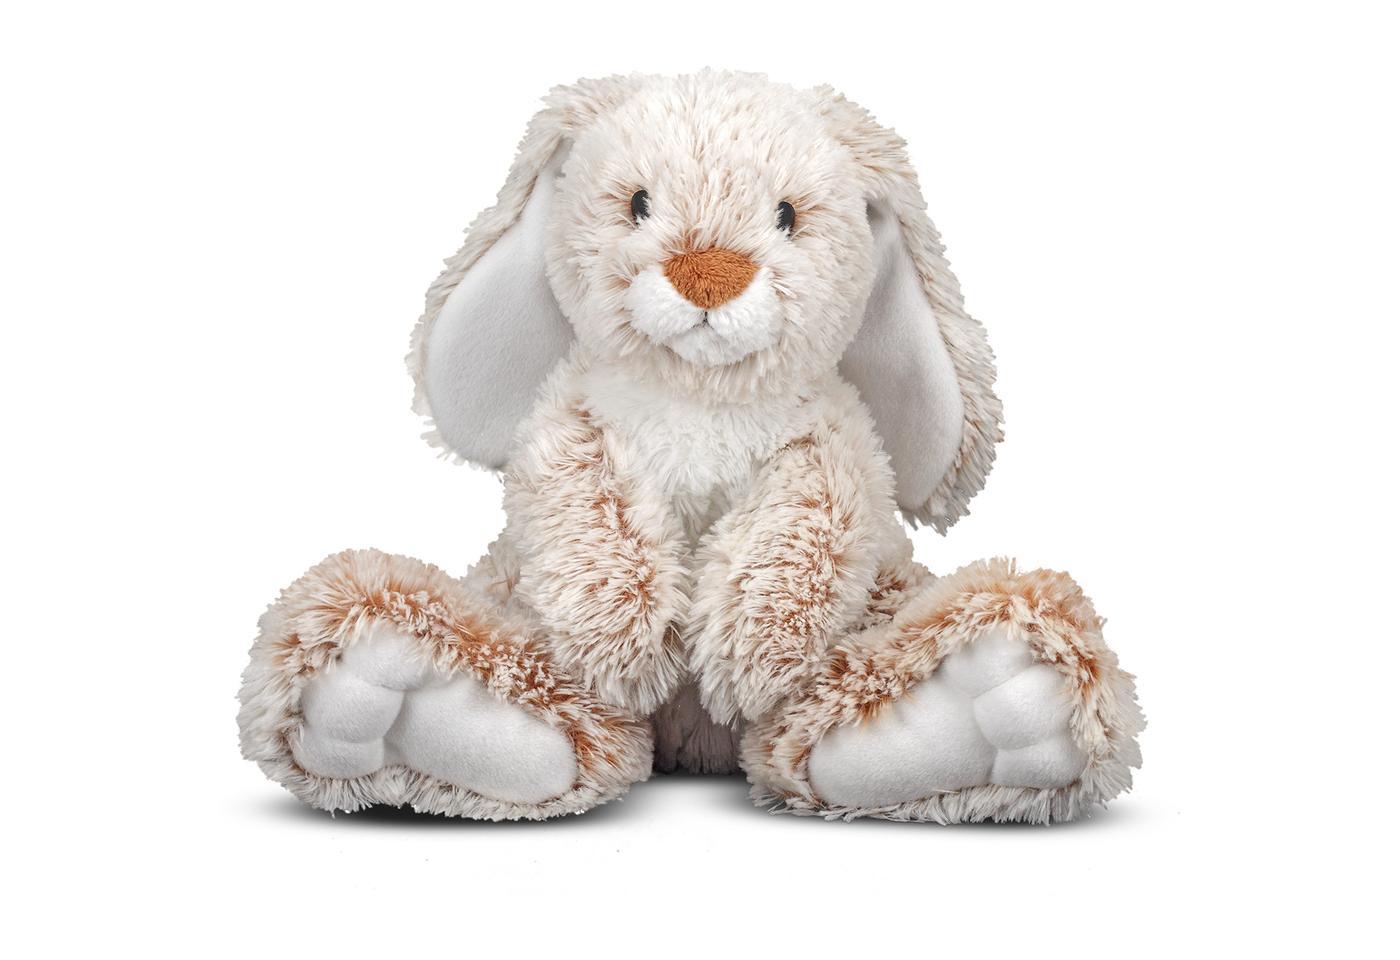 melissa and doug burrow bunny rabbit stuffed